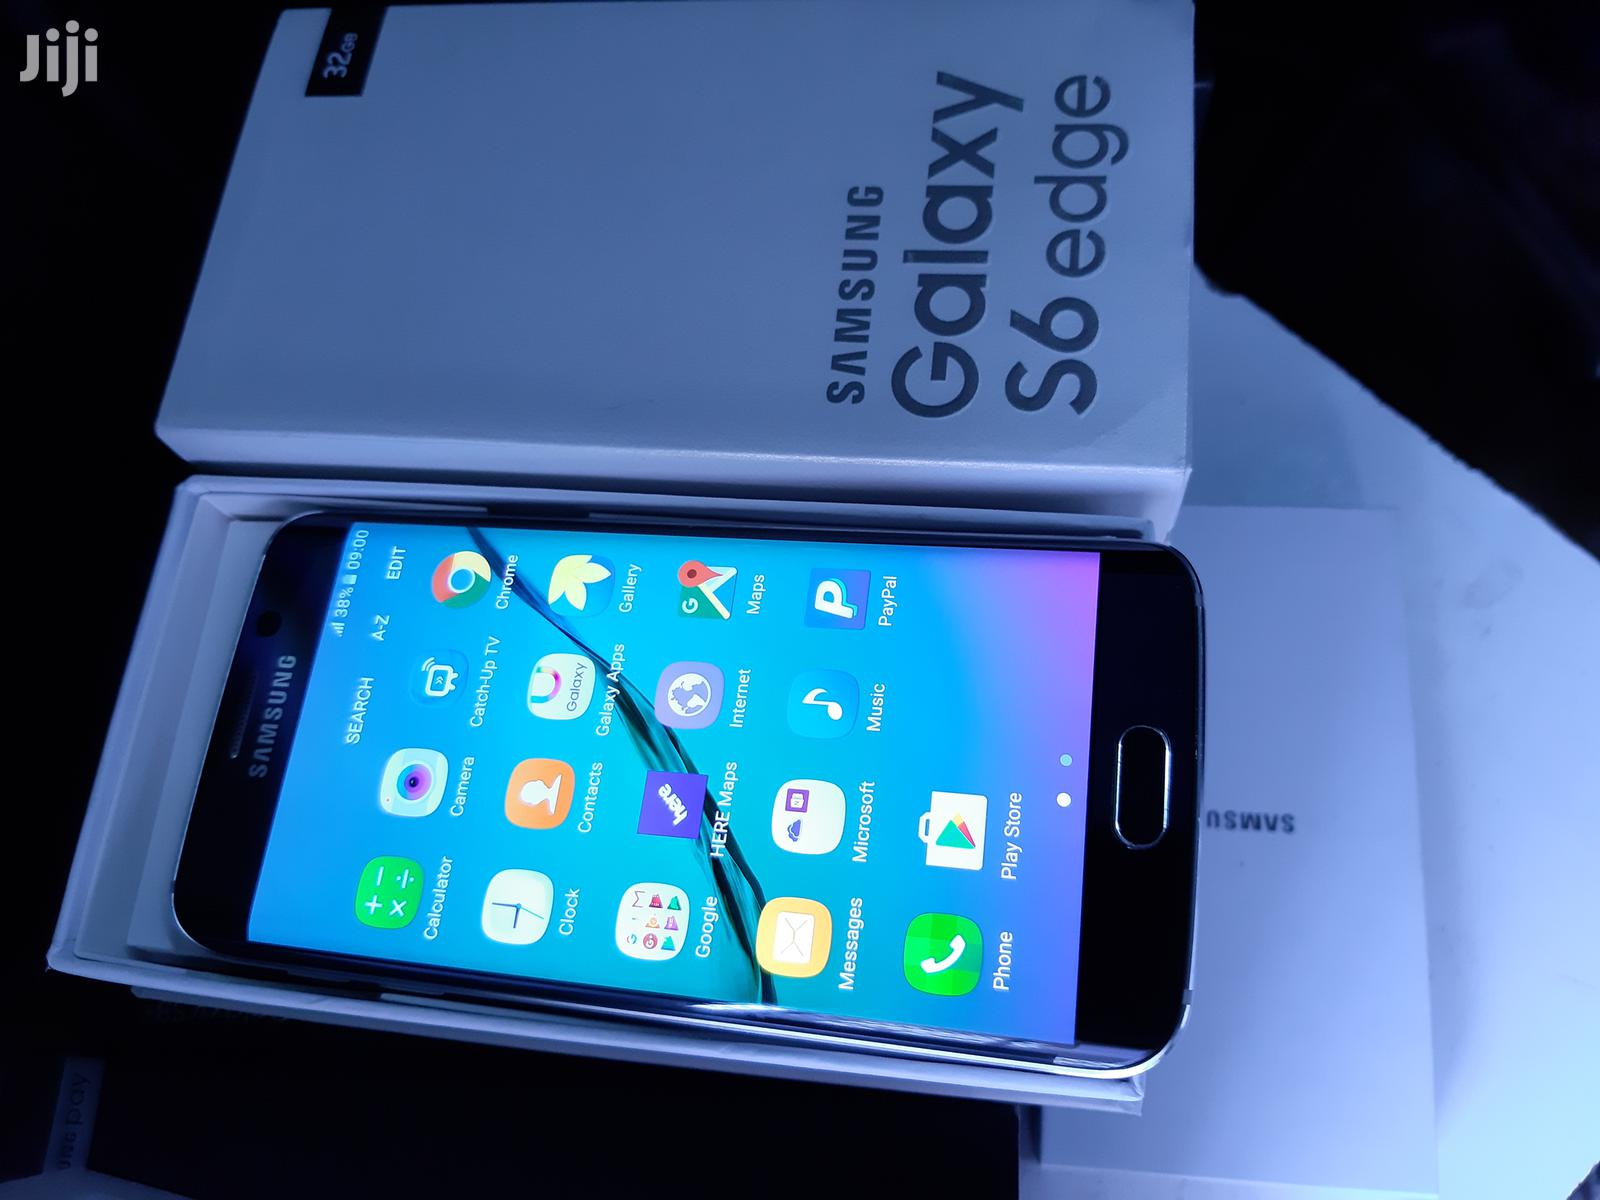 Samsung Galaxy S6 edge 32 GB | Mobile Phones for sale in Nairobi Central, Nairobi, Kenya